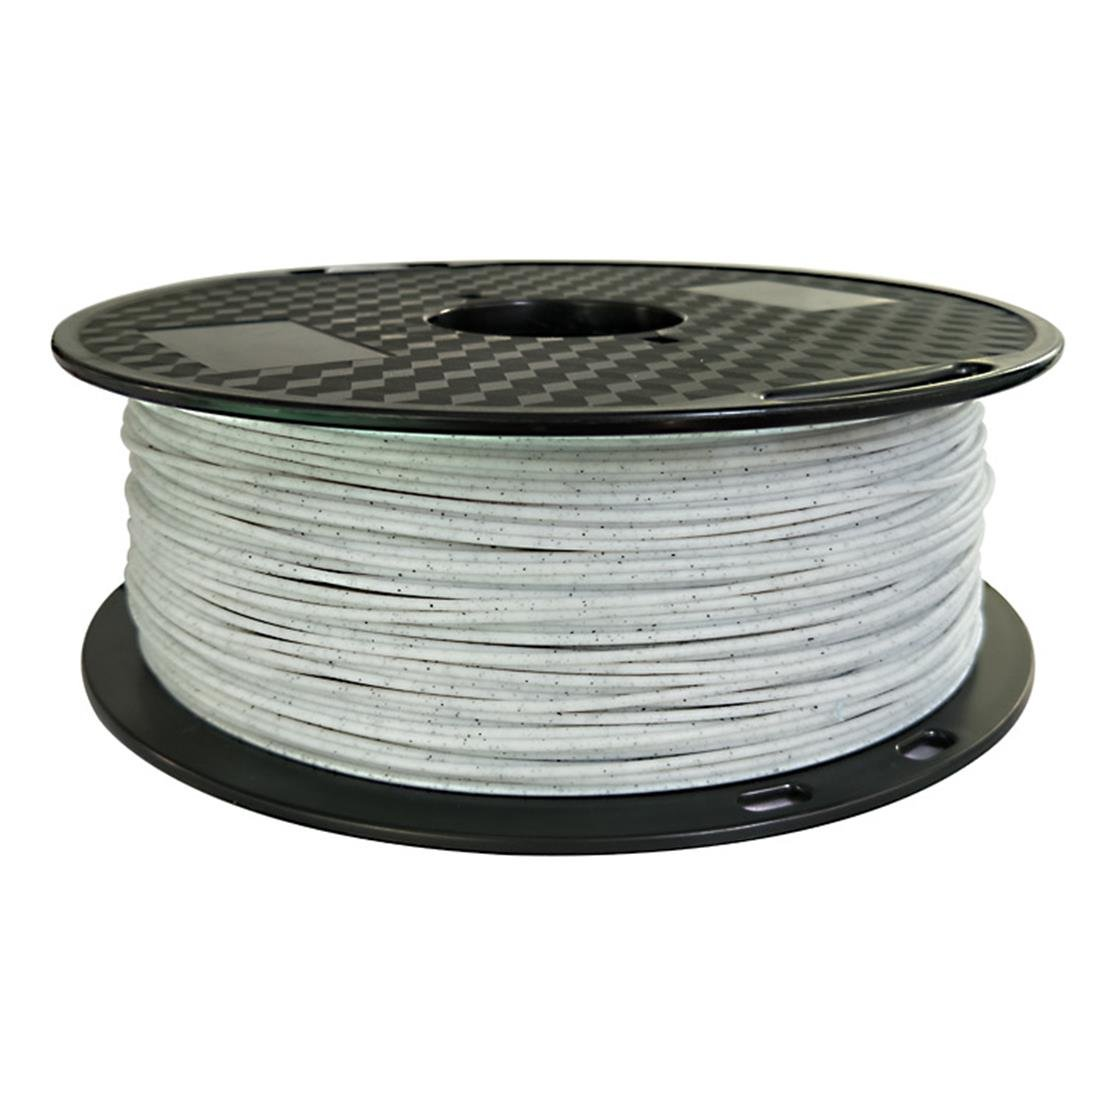 Guiyun 3D PLA, 1.75 mm, materiale di stampa 3D, 1 kilogram (1KG) bobina 3D filamento per stampanti 3D, marmo PLA 1.75mm 1kilogram (1KG) bobina 3D filamento per stampanti 3D A03-DYHCPDLS-GY